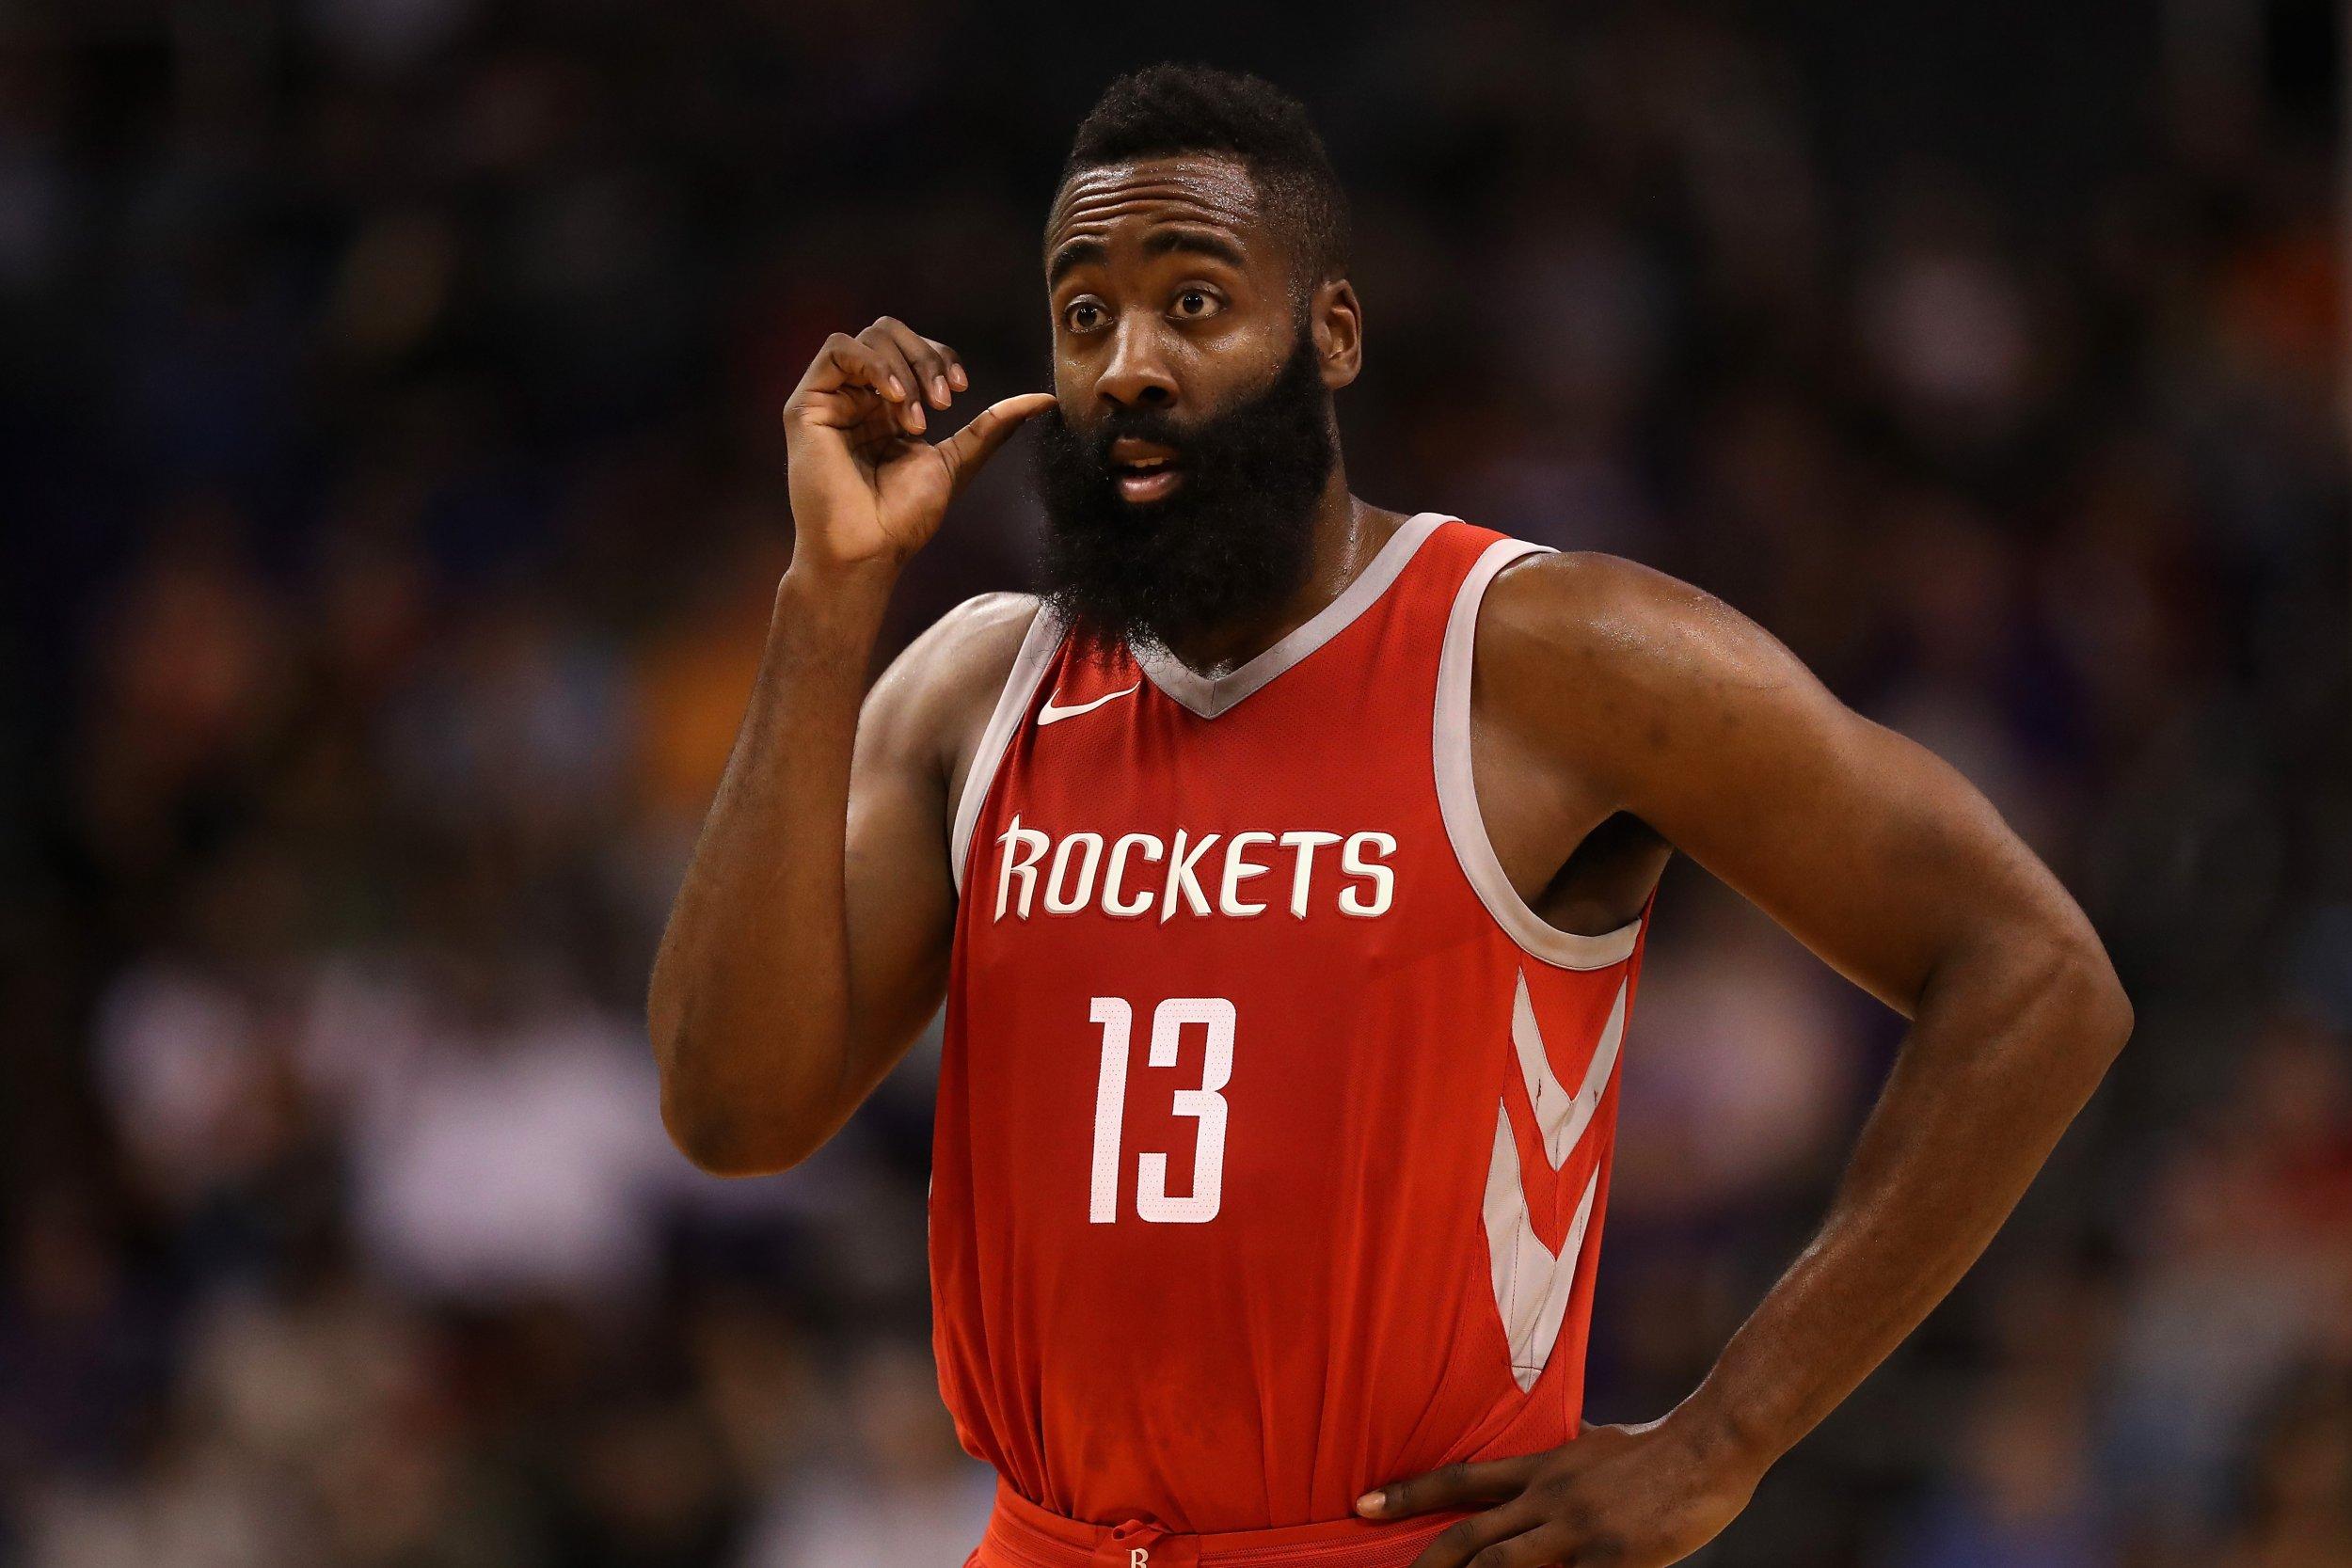 Houston Rockets guard James Harden.